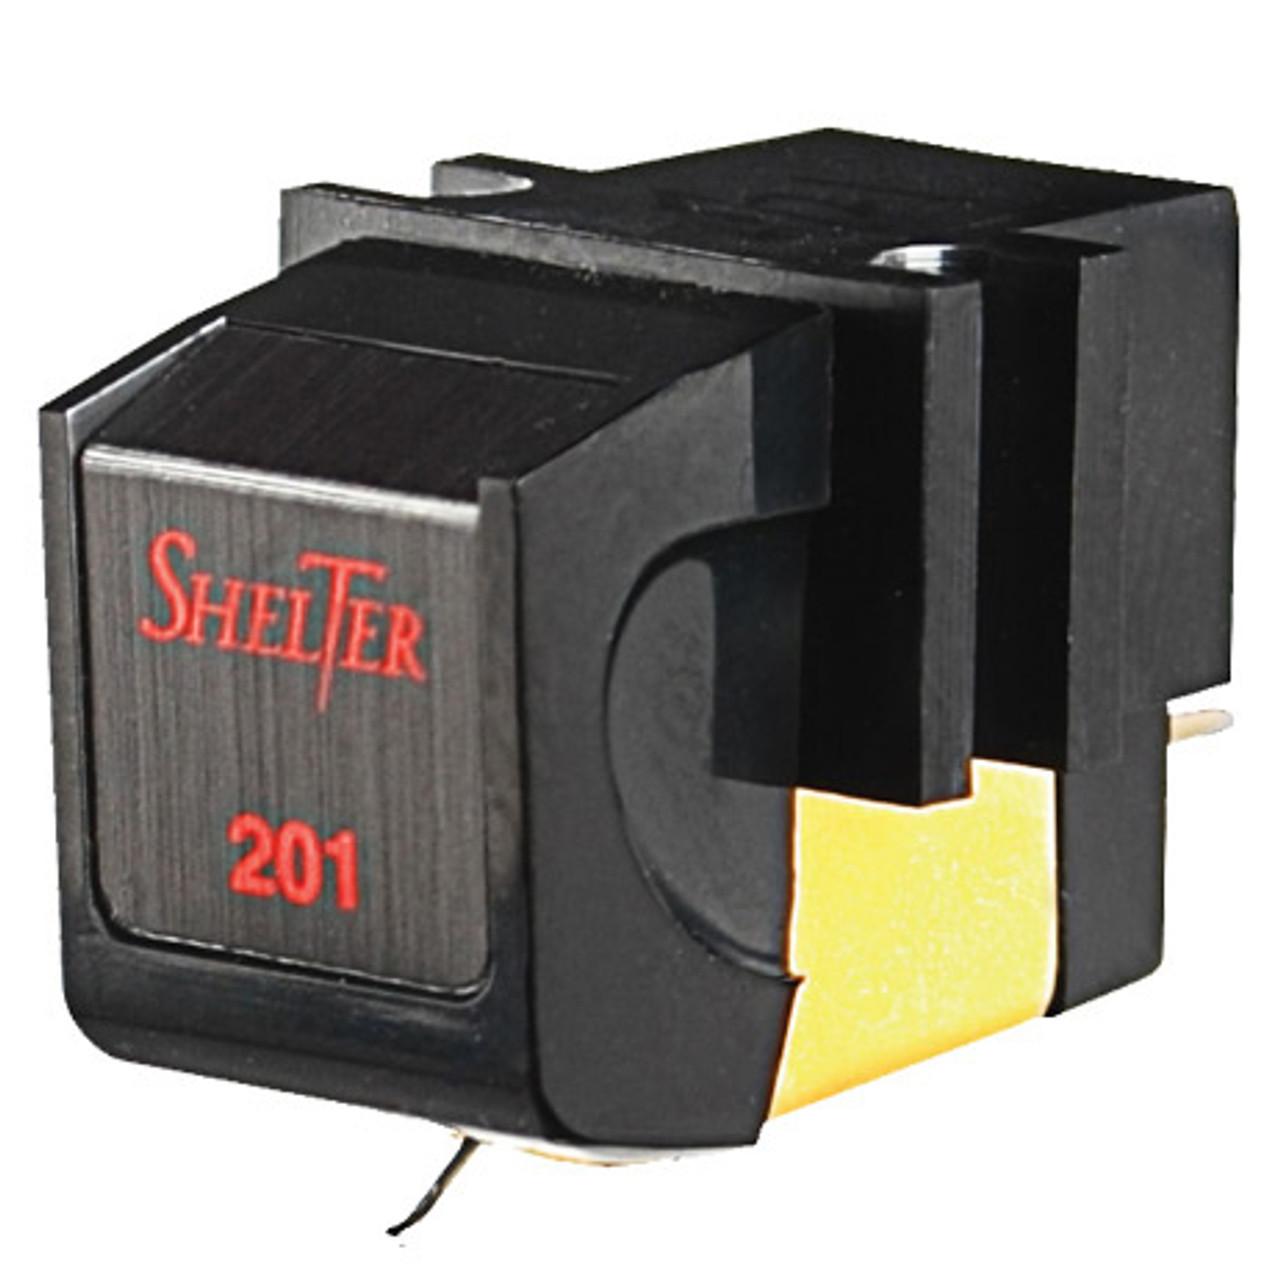 Shelter 201 MM Phono Cartridge